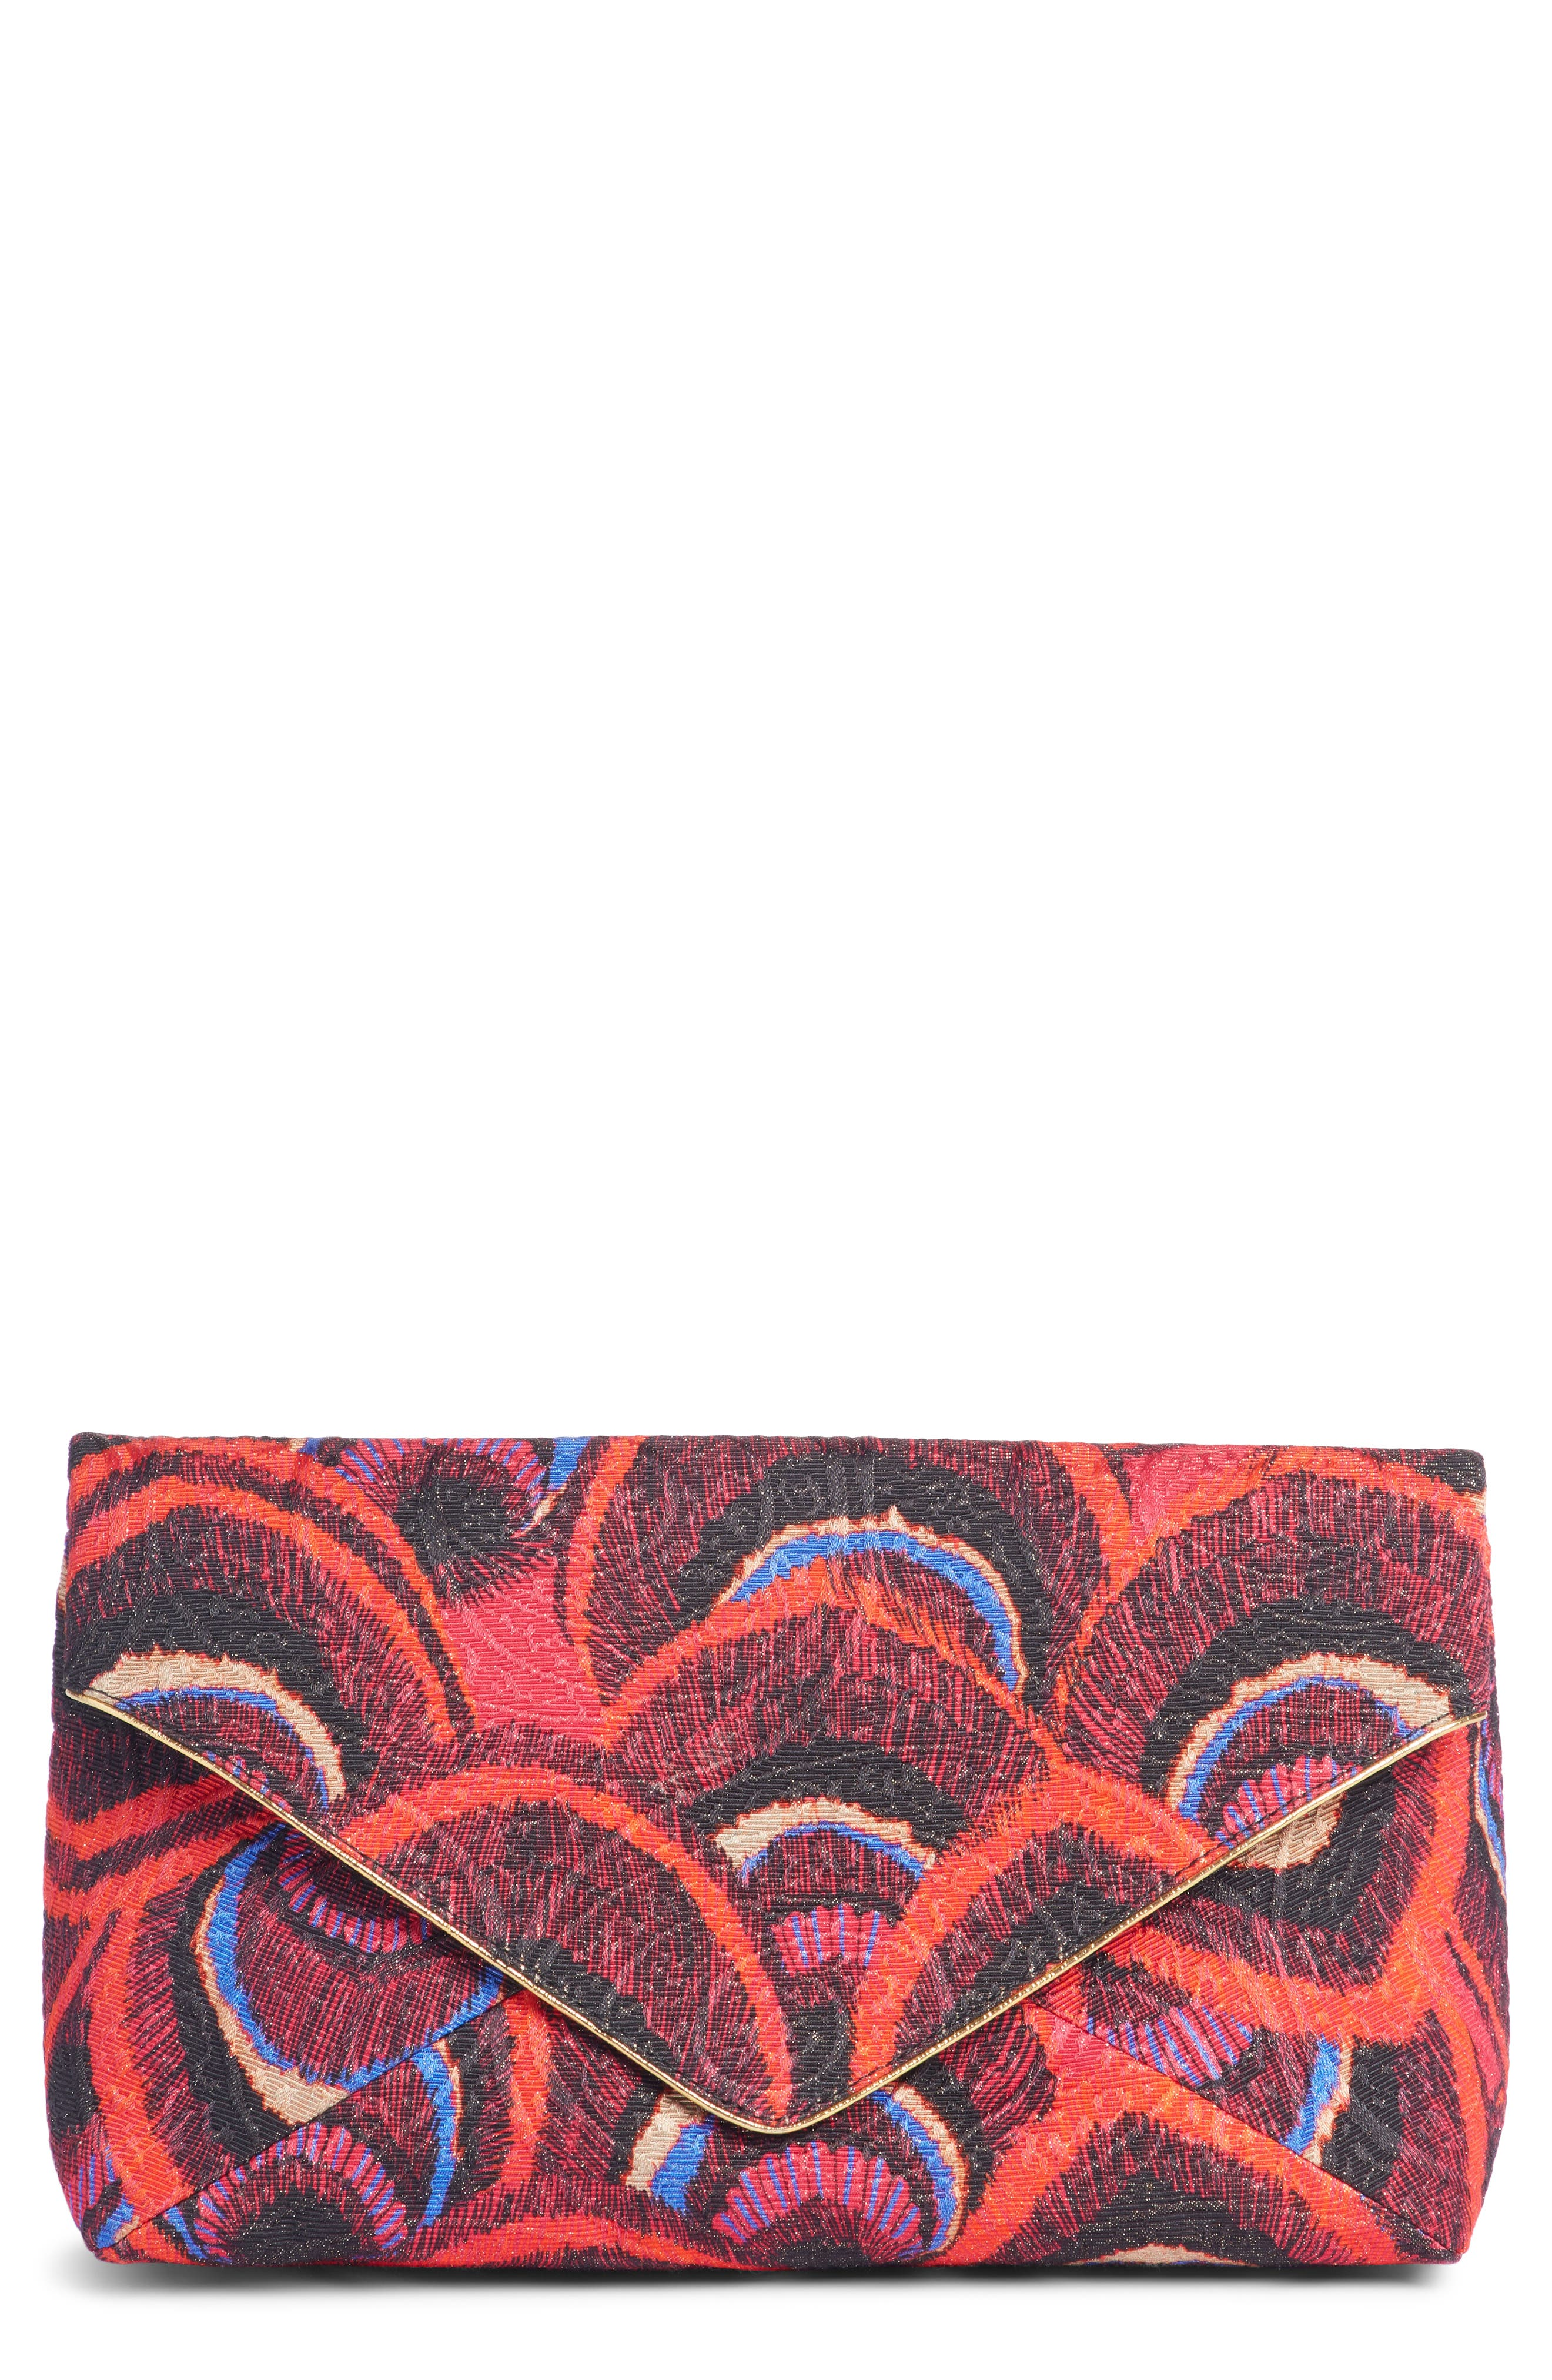 Peacock Jacquard Envelope Clutch,                         Main,                         color, CHERRY